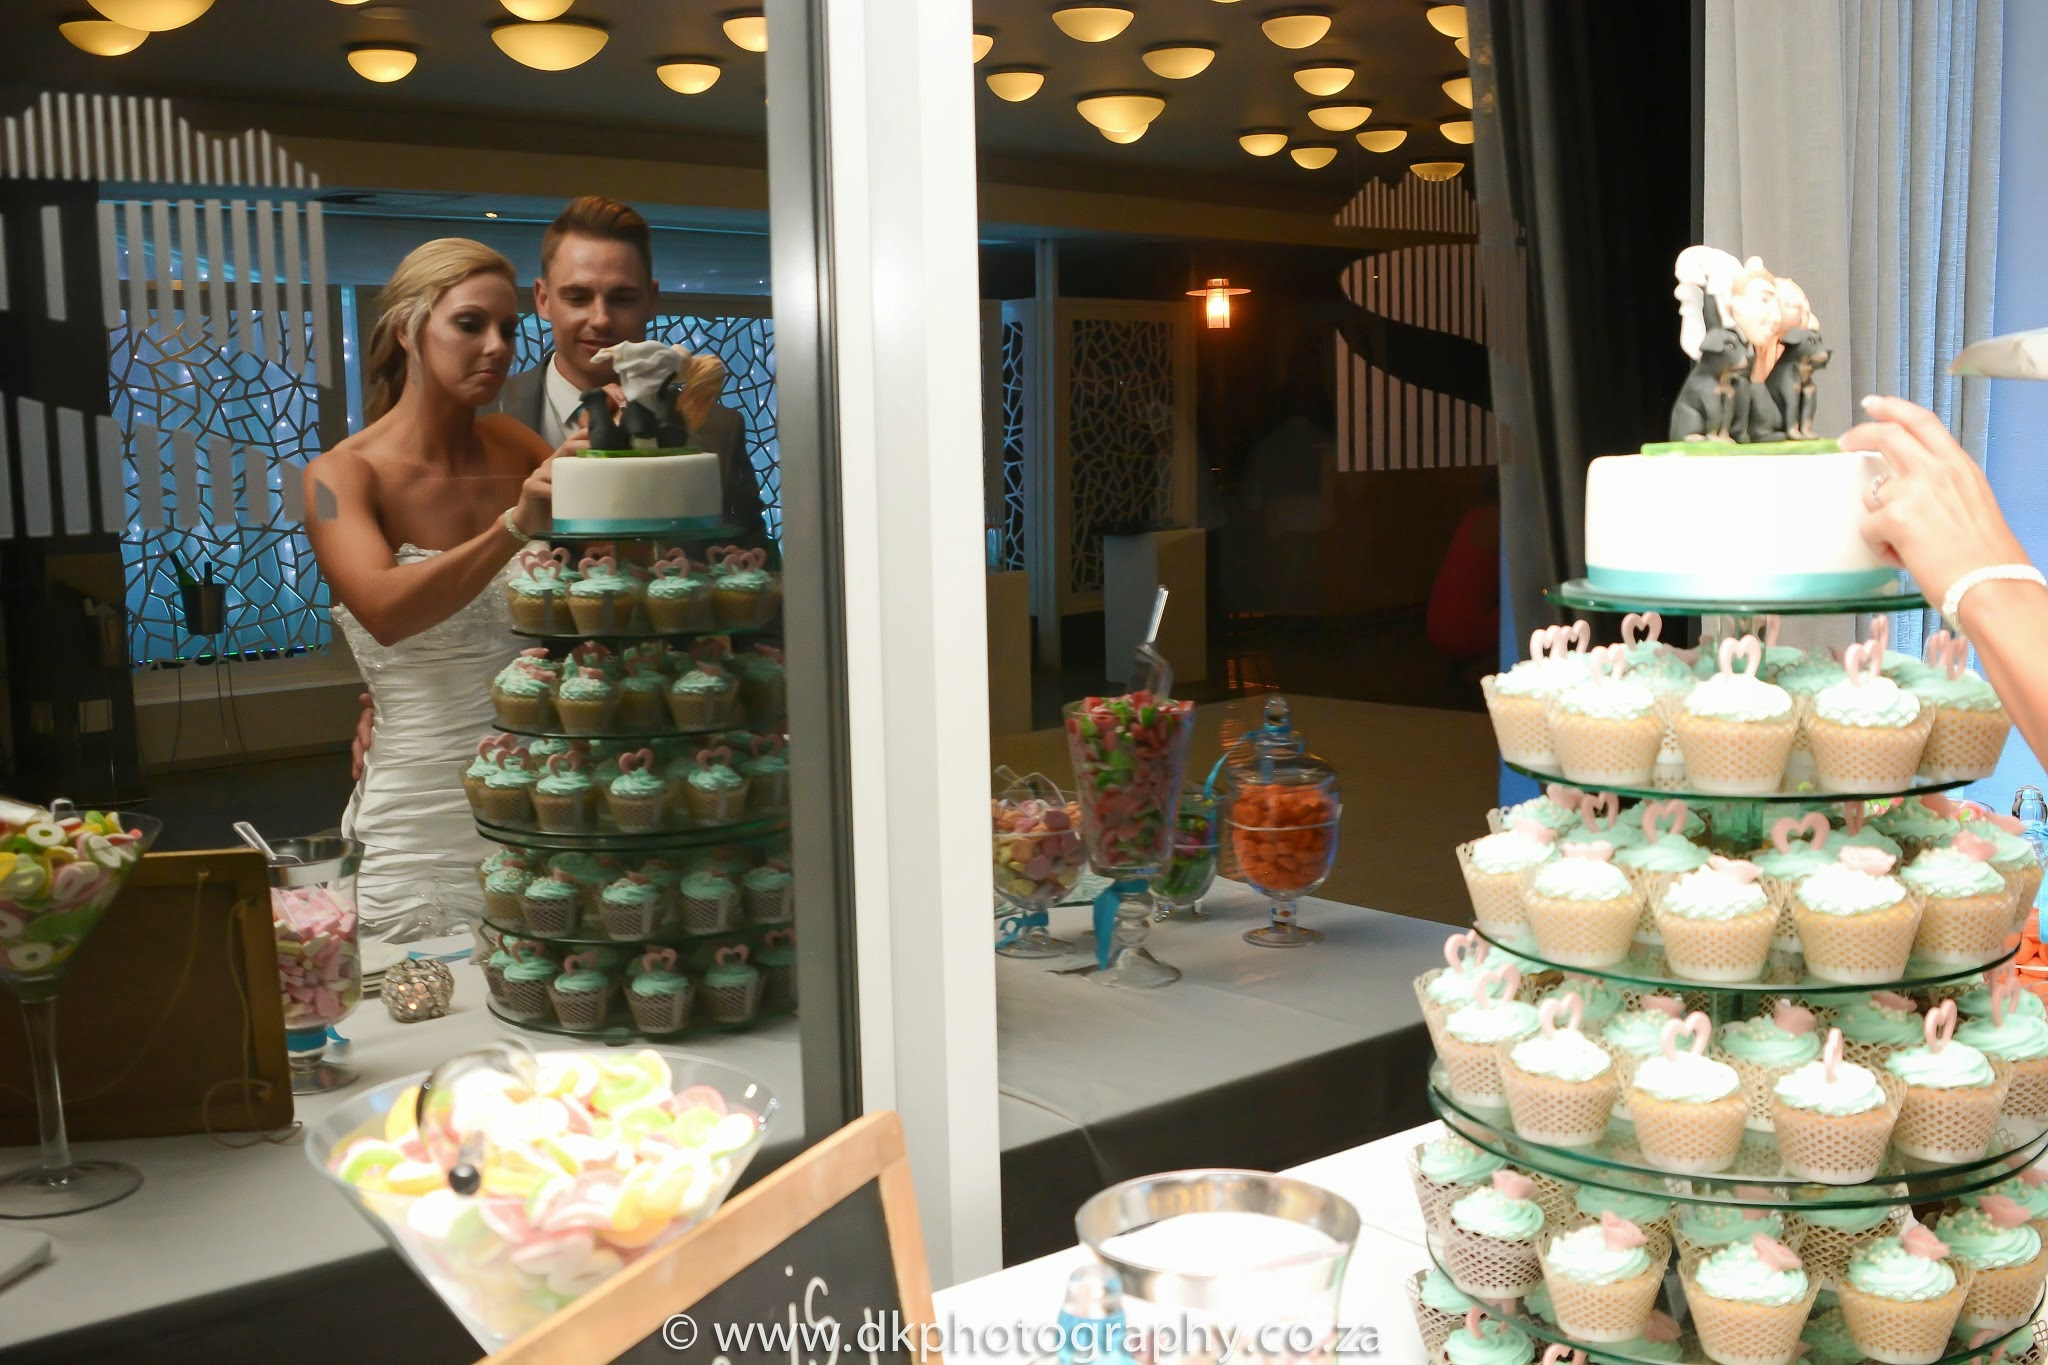 DK Photography CCD_7656 Wynand & Megan's Wedding in Lagoon Beach Hotel